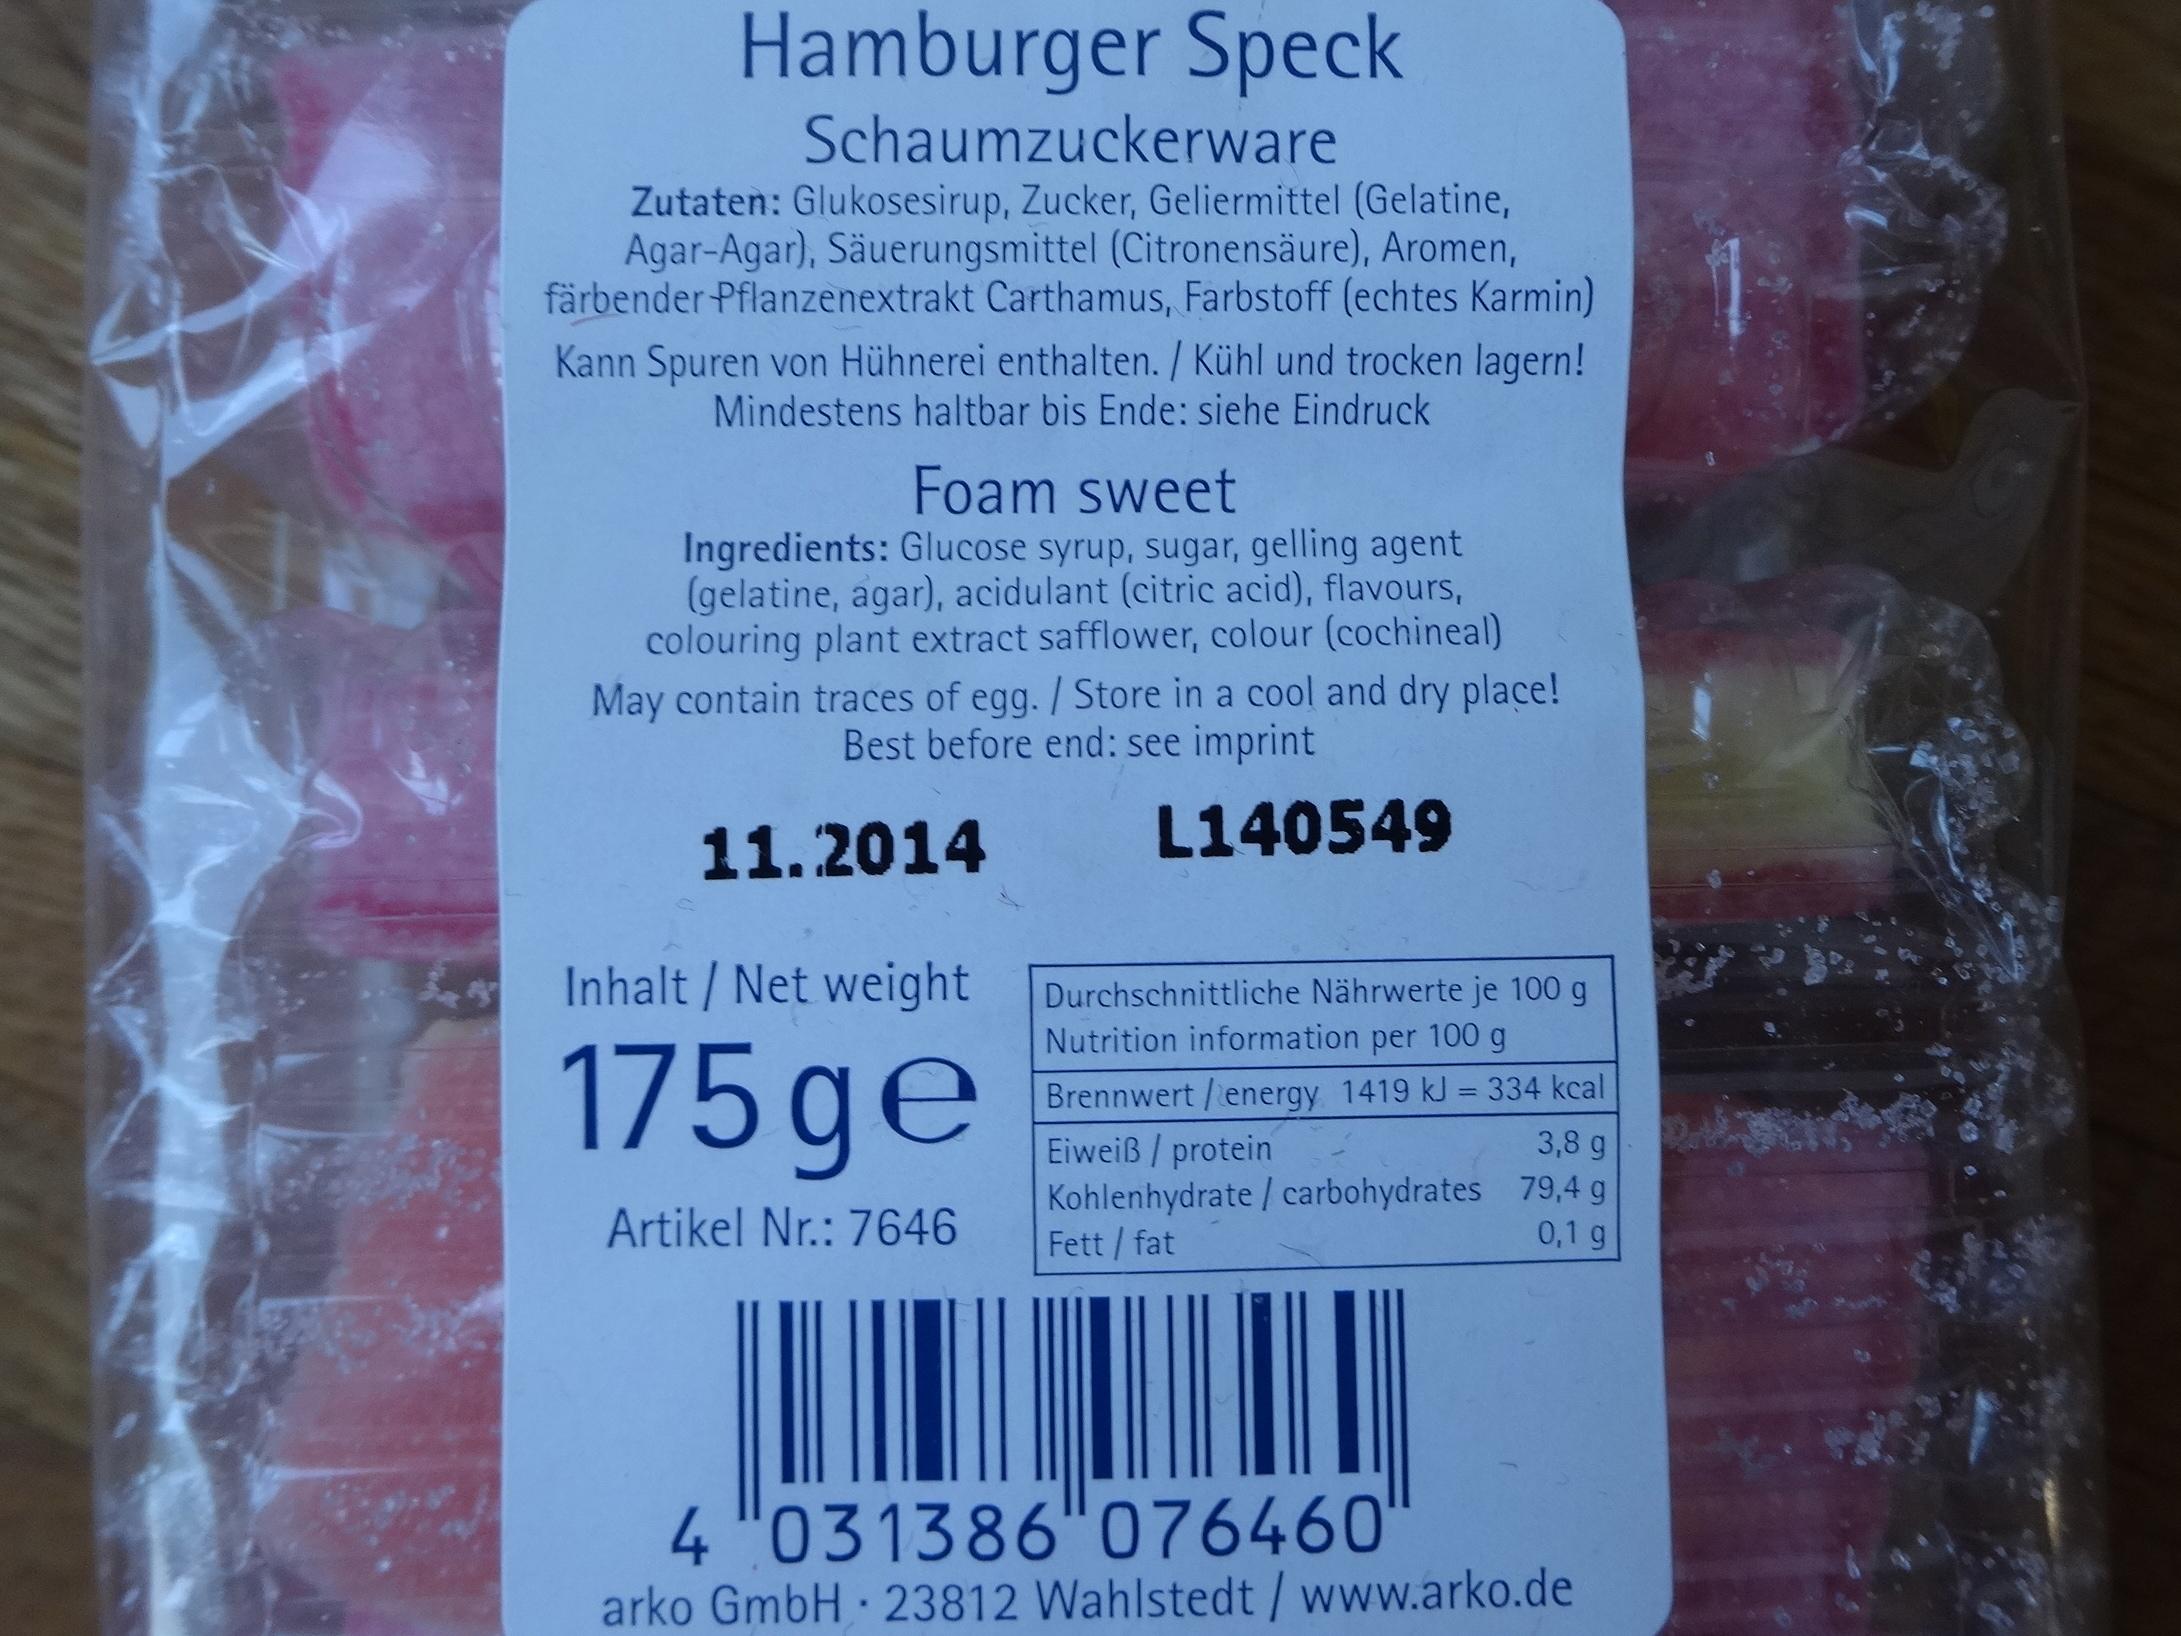 DSC03465 Hamburg Hamburger Speck 2 HappyFace313